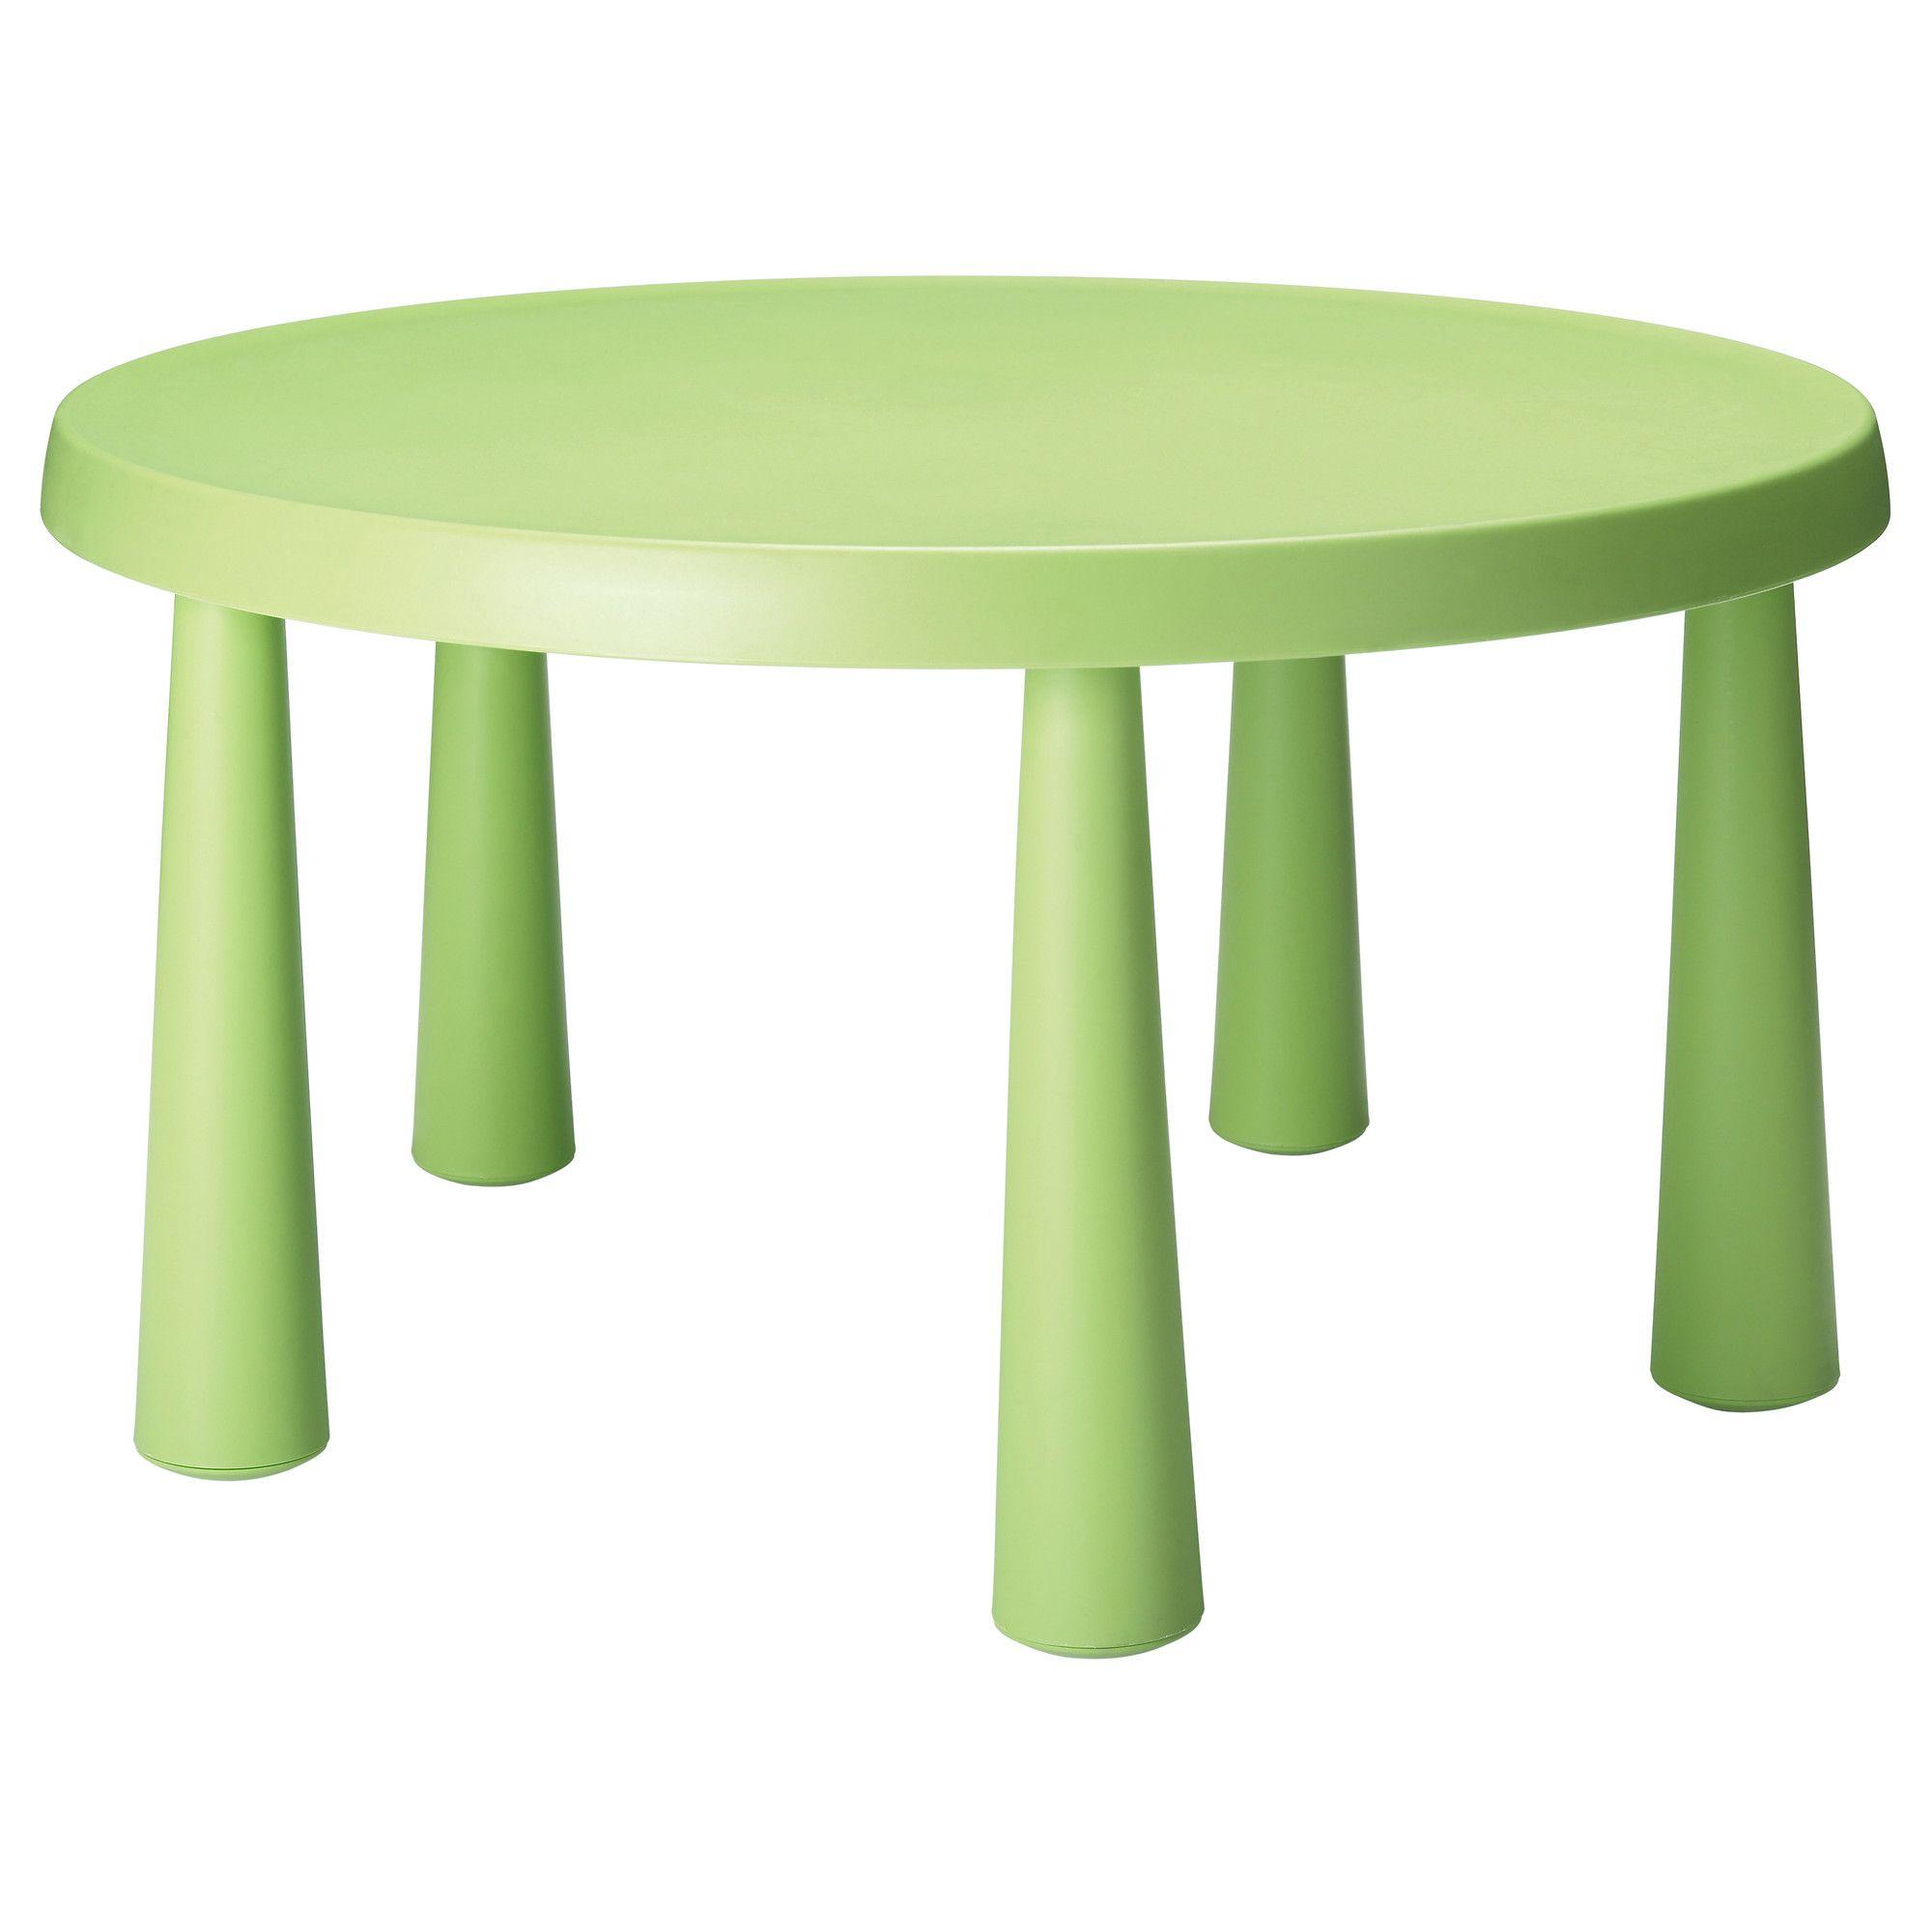 Mammut Children S Table Light Green 33 1 2 Ikea Love